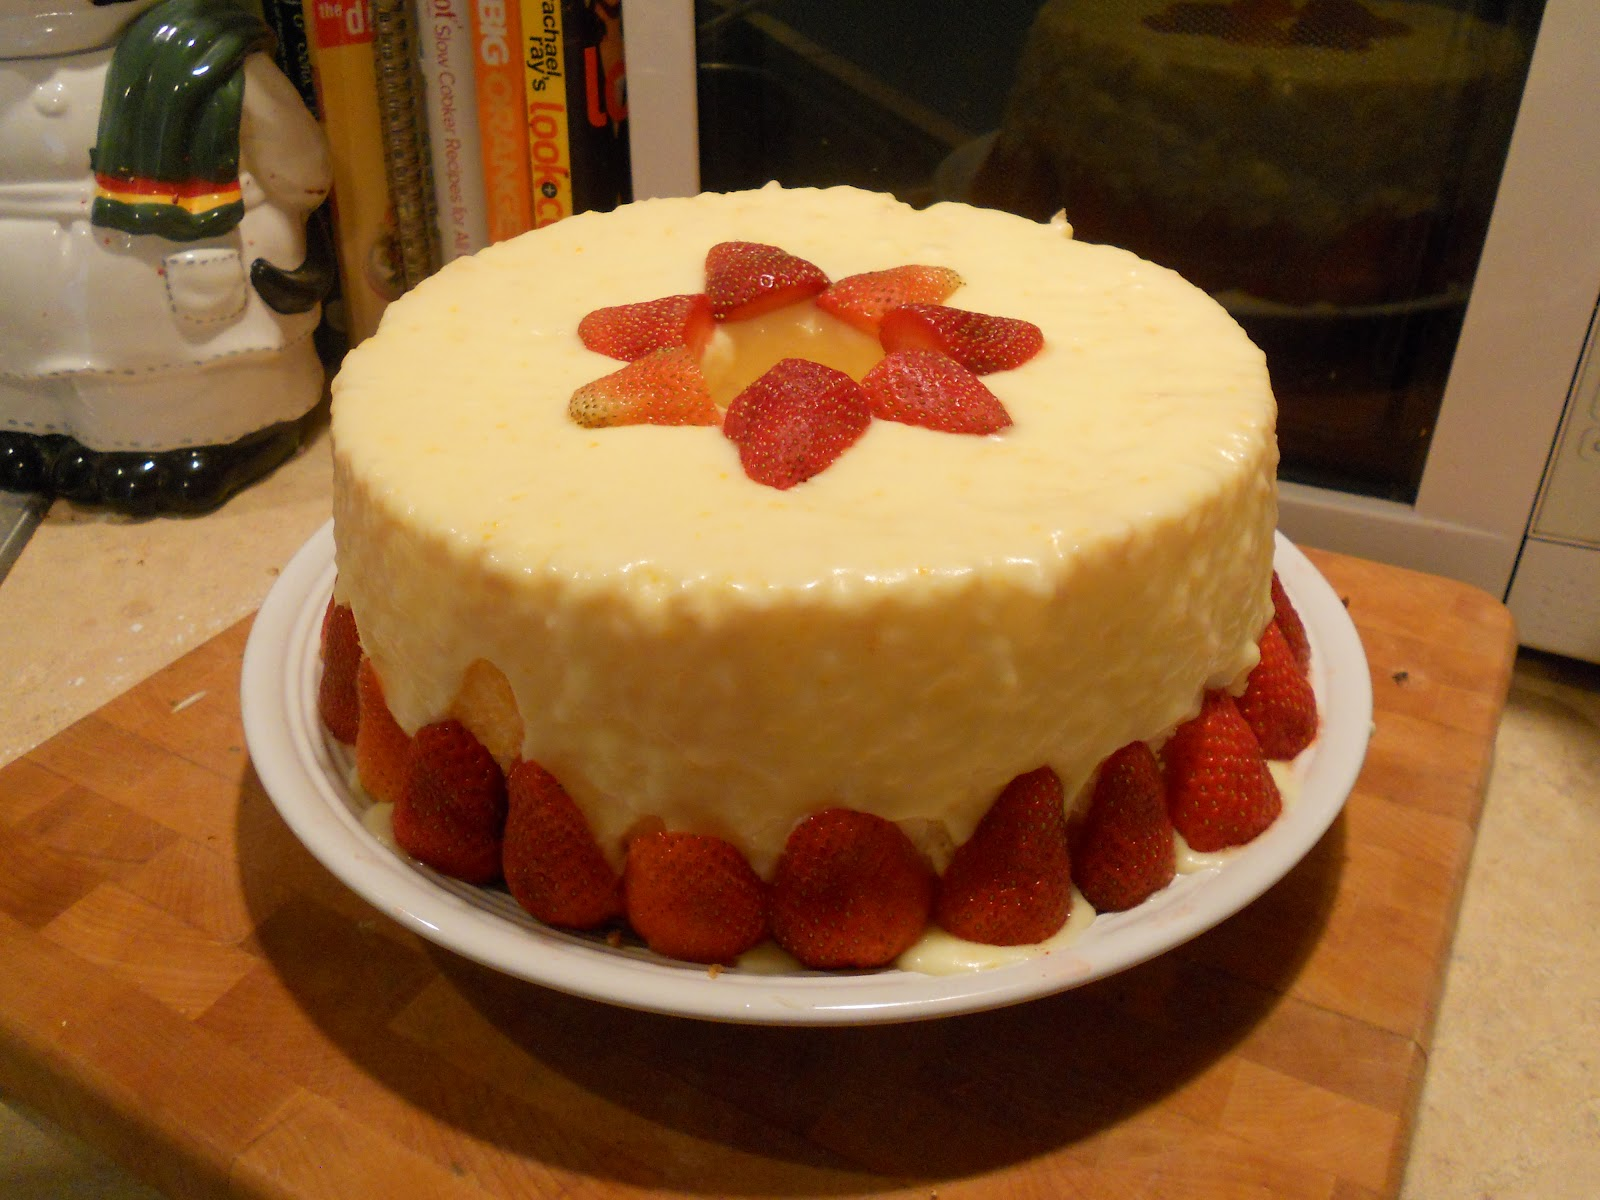 ... Emily: Angel Food Cake With An Orange Glaze with Fresh Strawberries